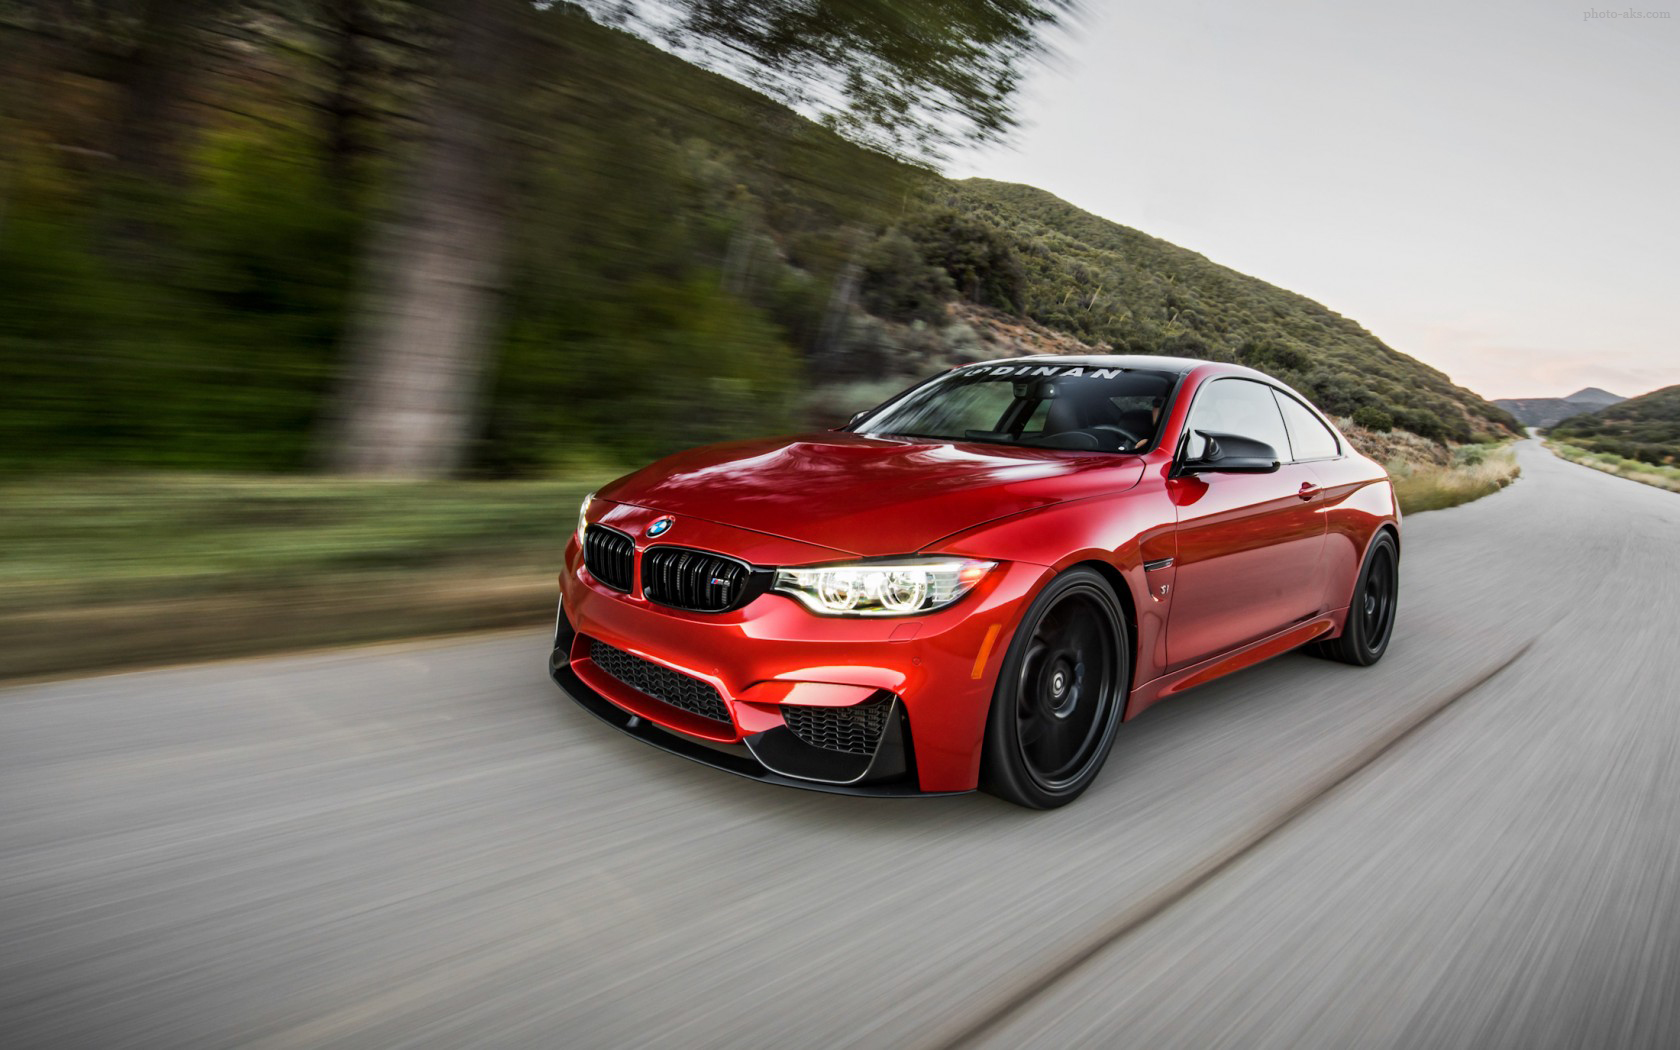 پوستر ماشین بی ام دبلیو ام چهار bmw m4 red speed car